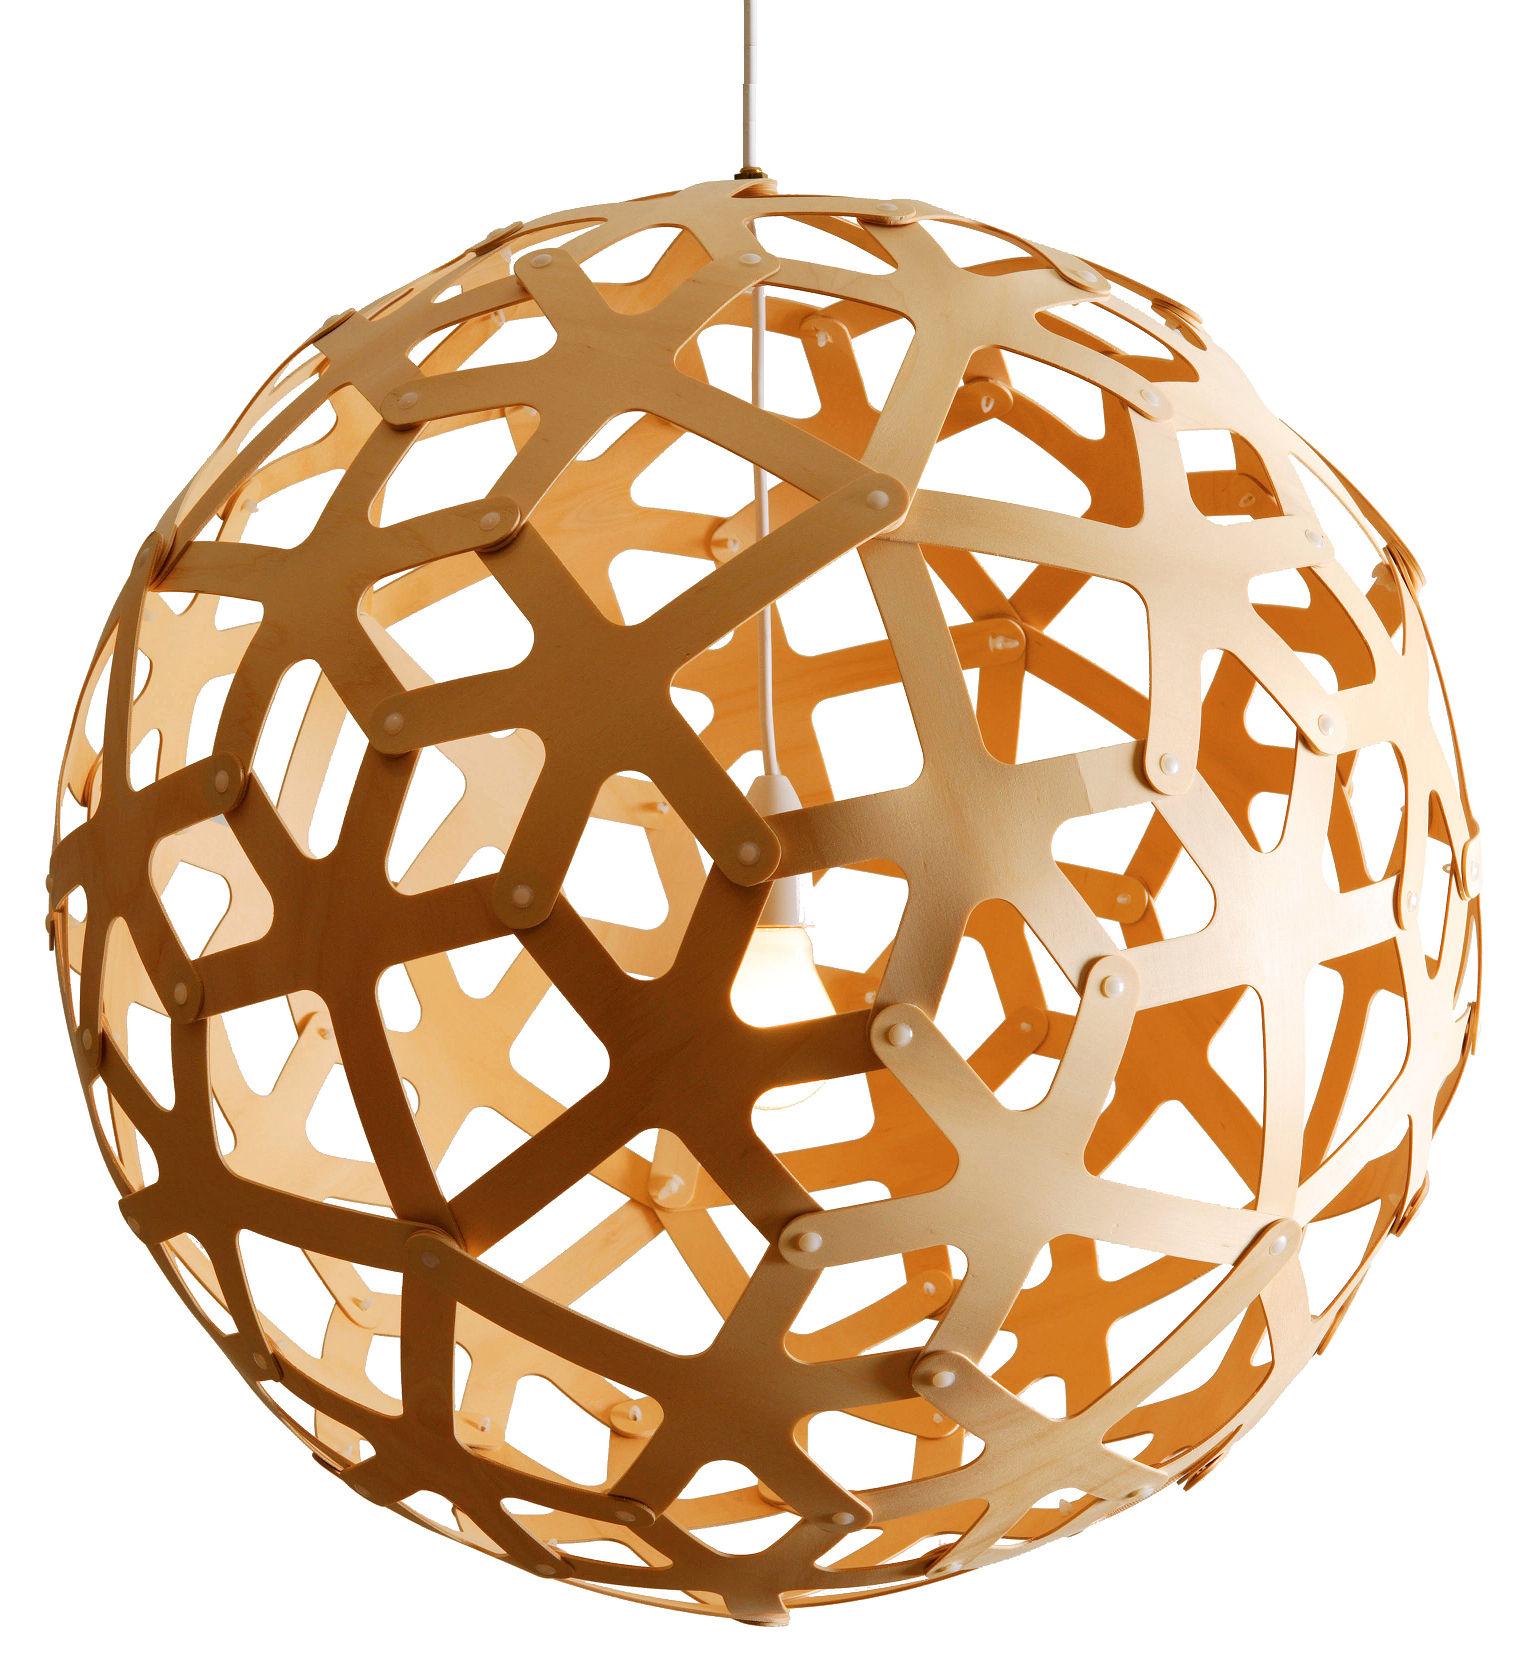 Lighting - Pendant Lighting - Coral Pendant - / Ø 80 cm by David Trubridge - Wood - Pine plywood